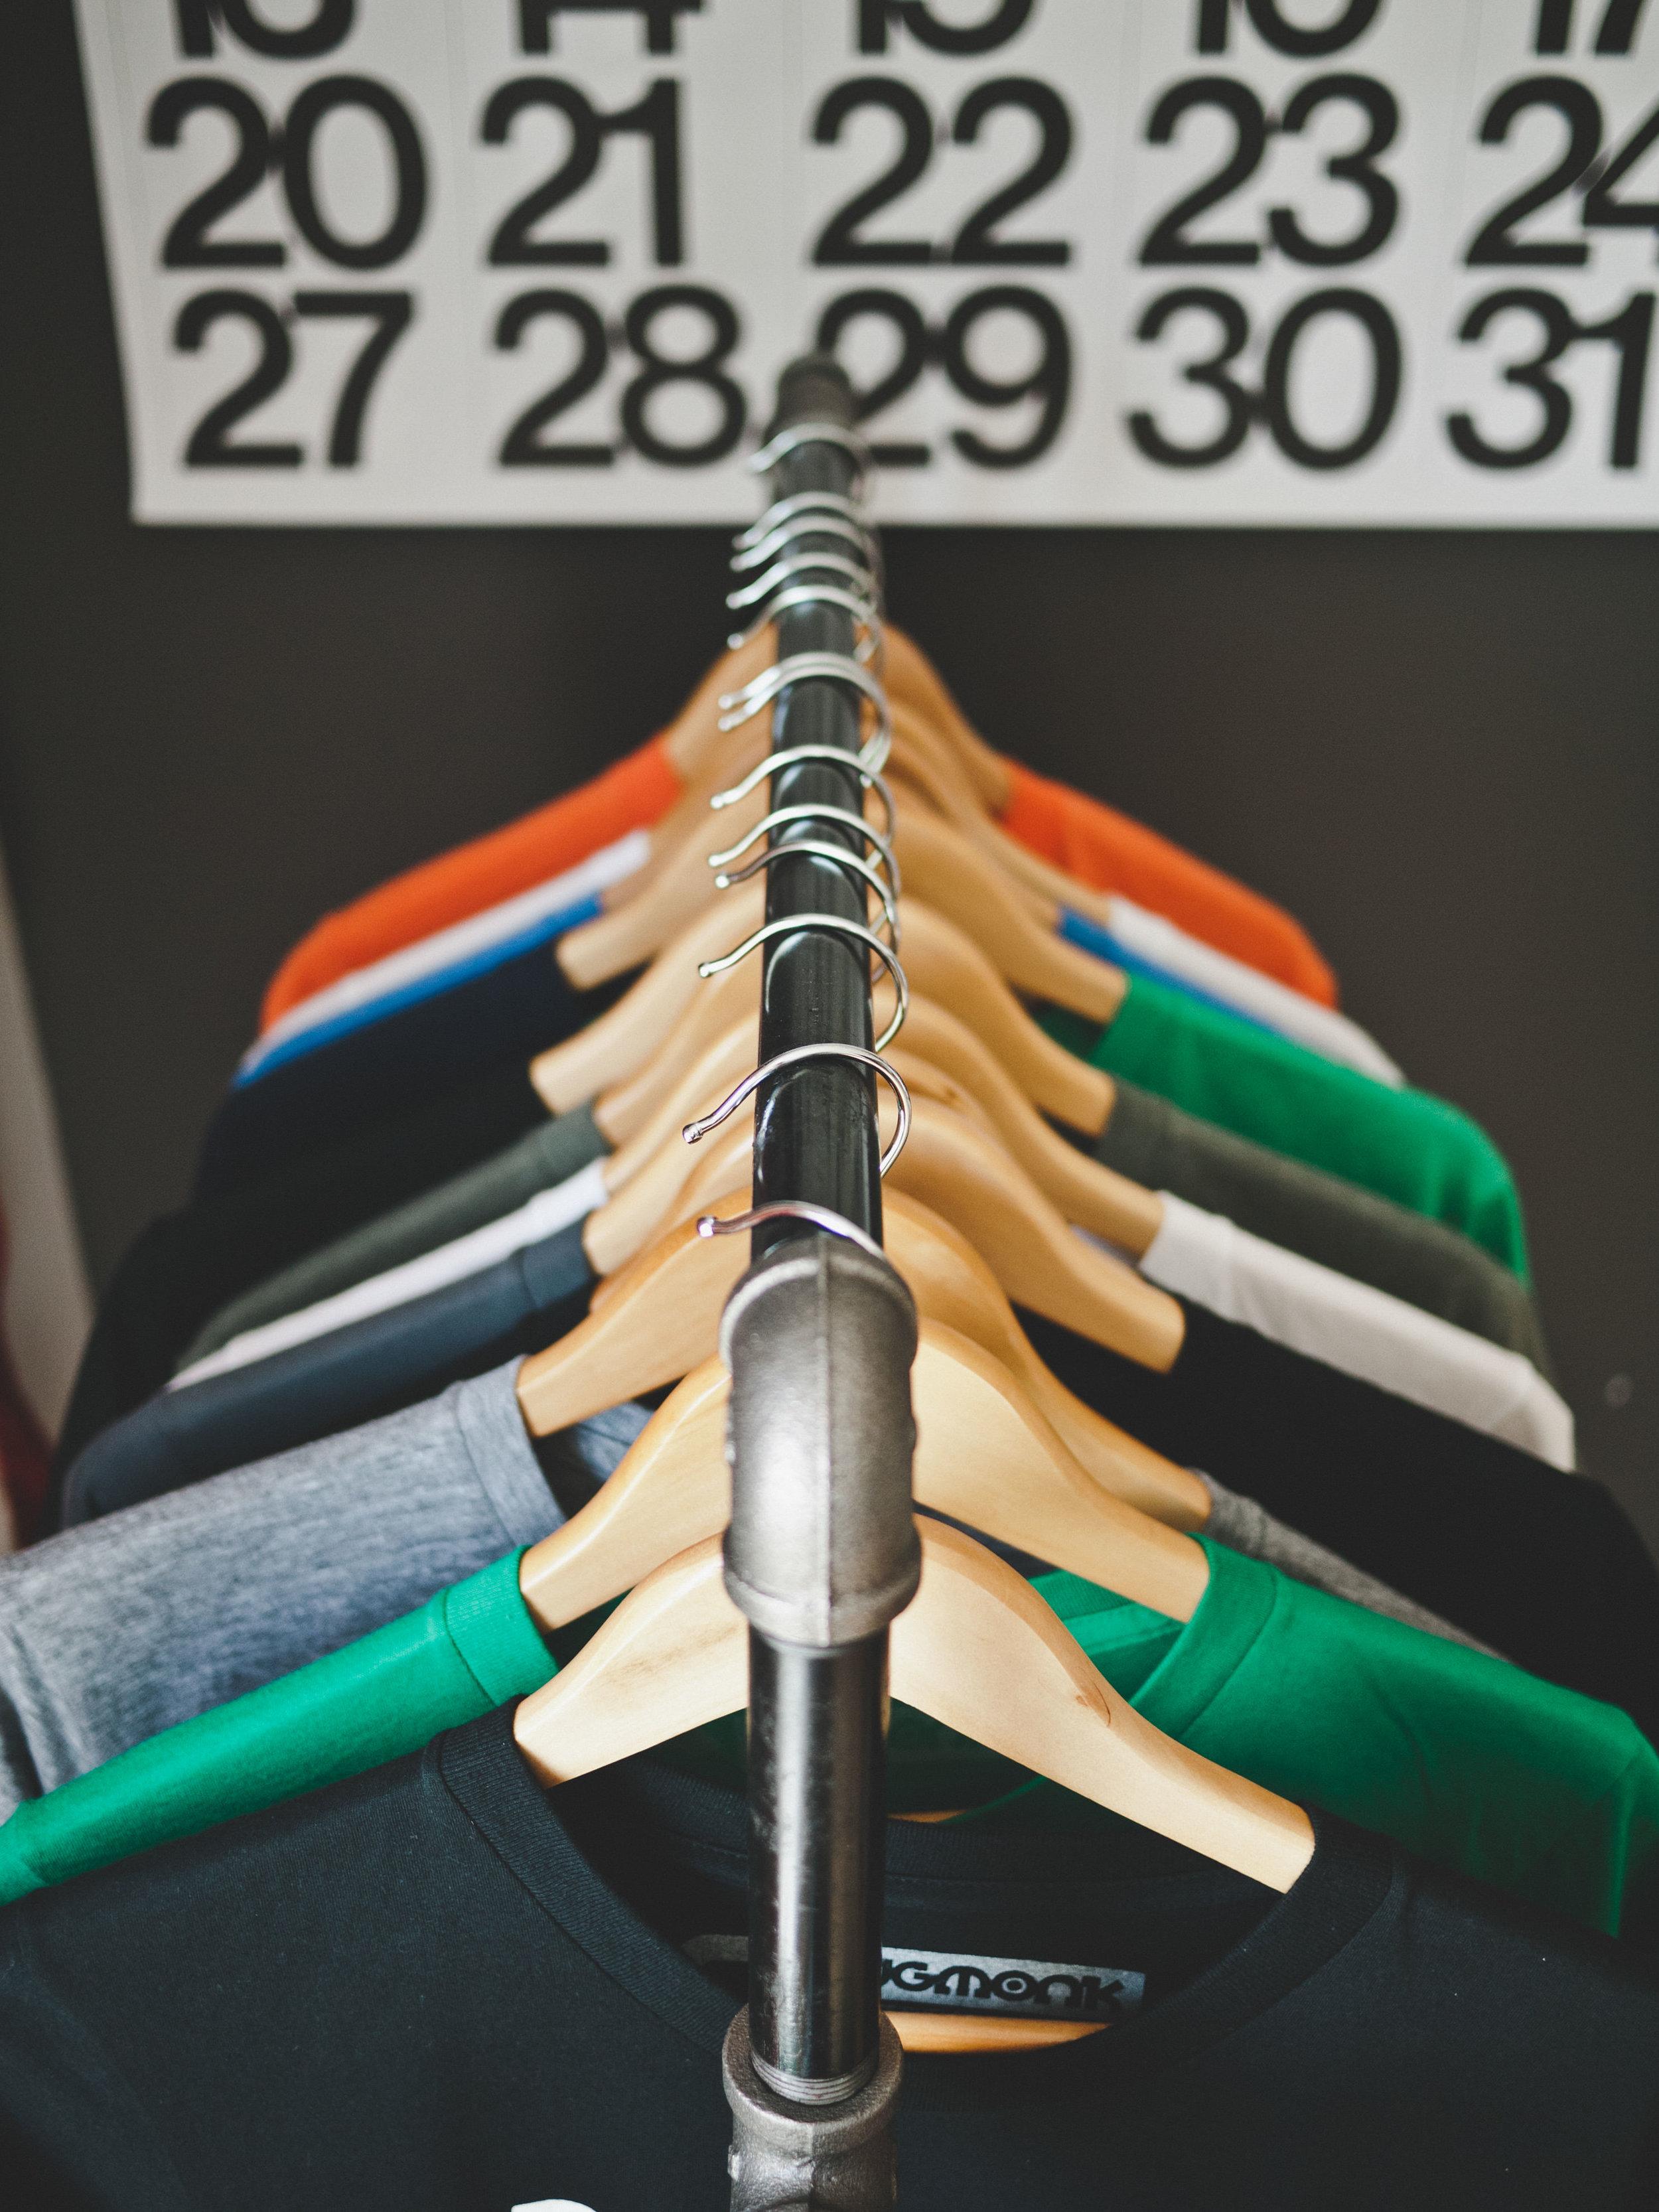 clothes_01.jpeg